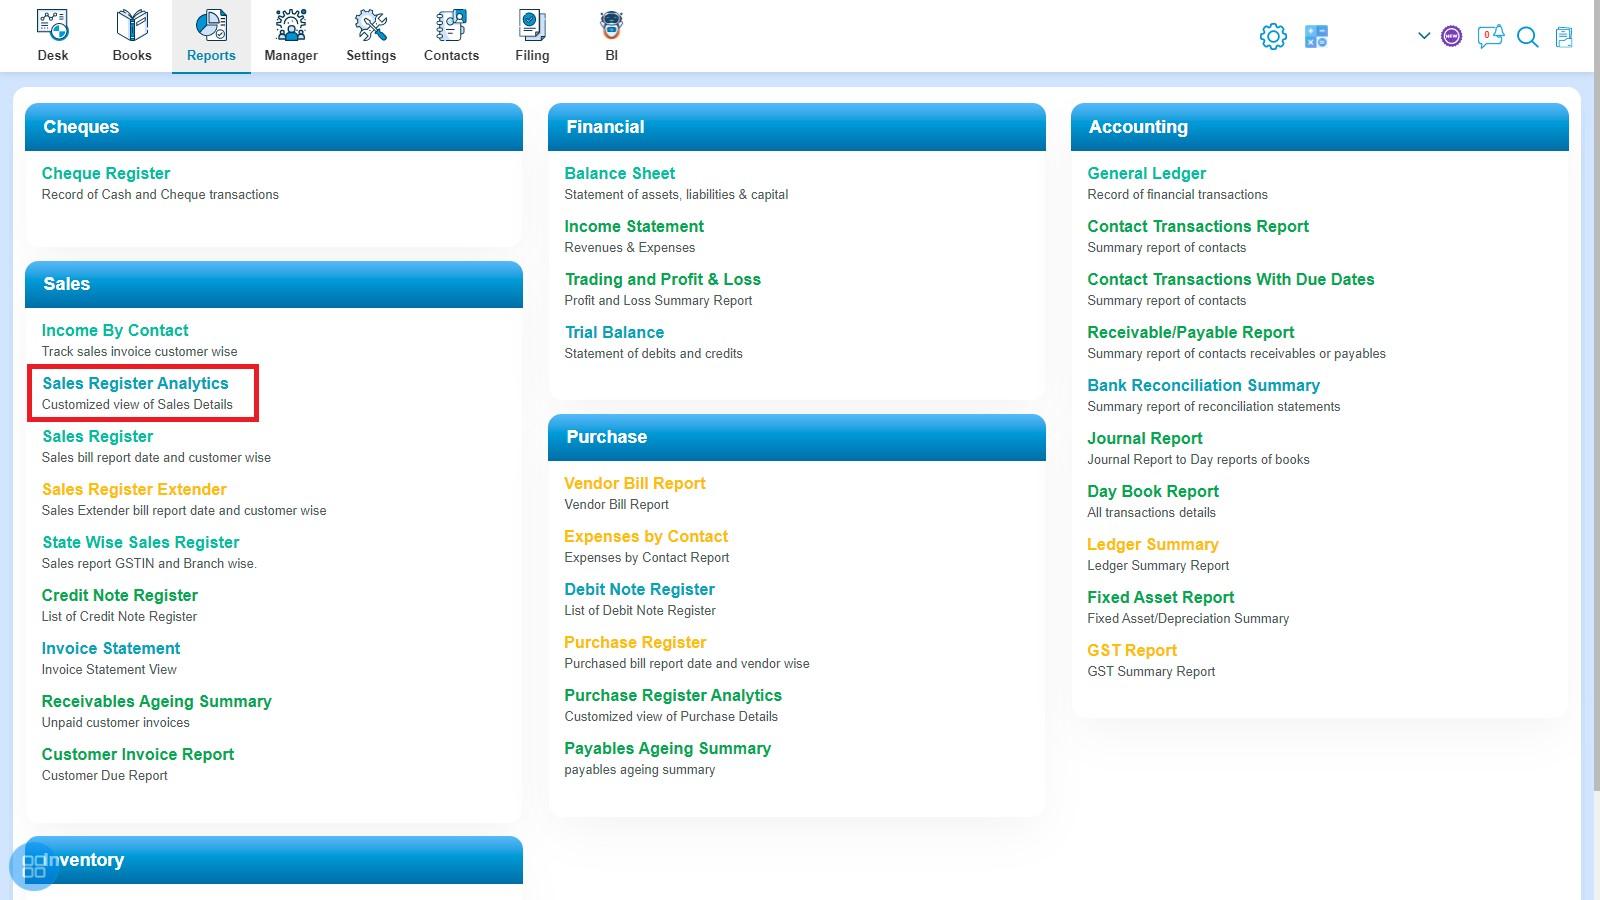 sales-register-analytics